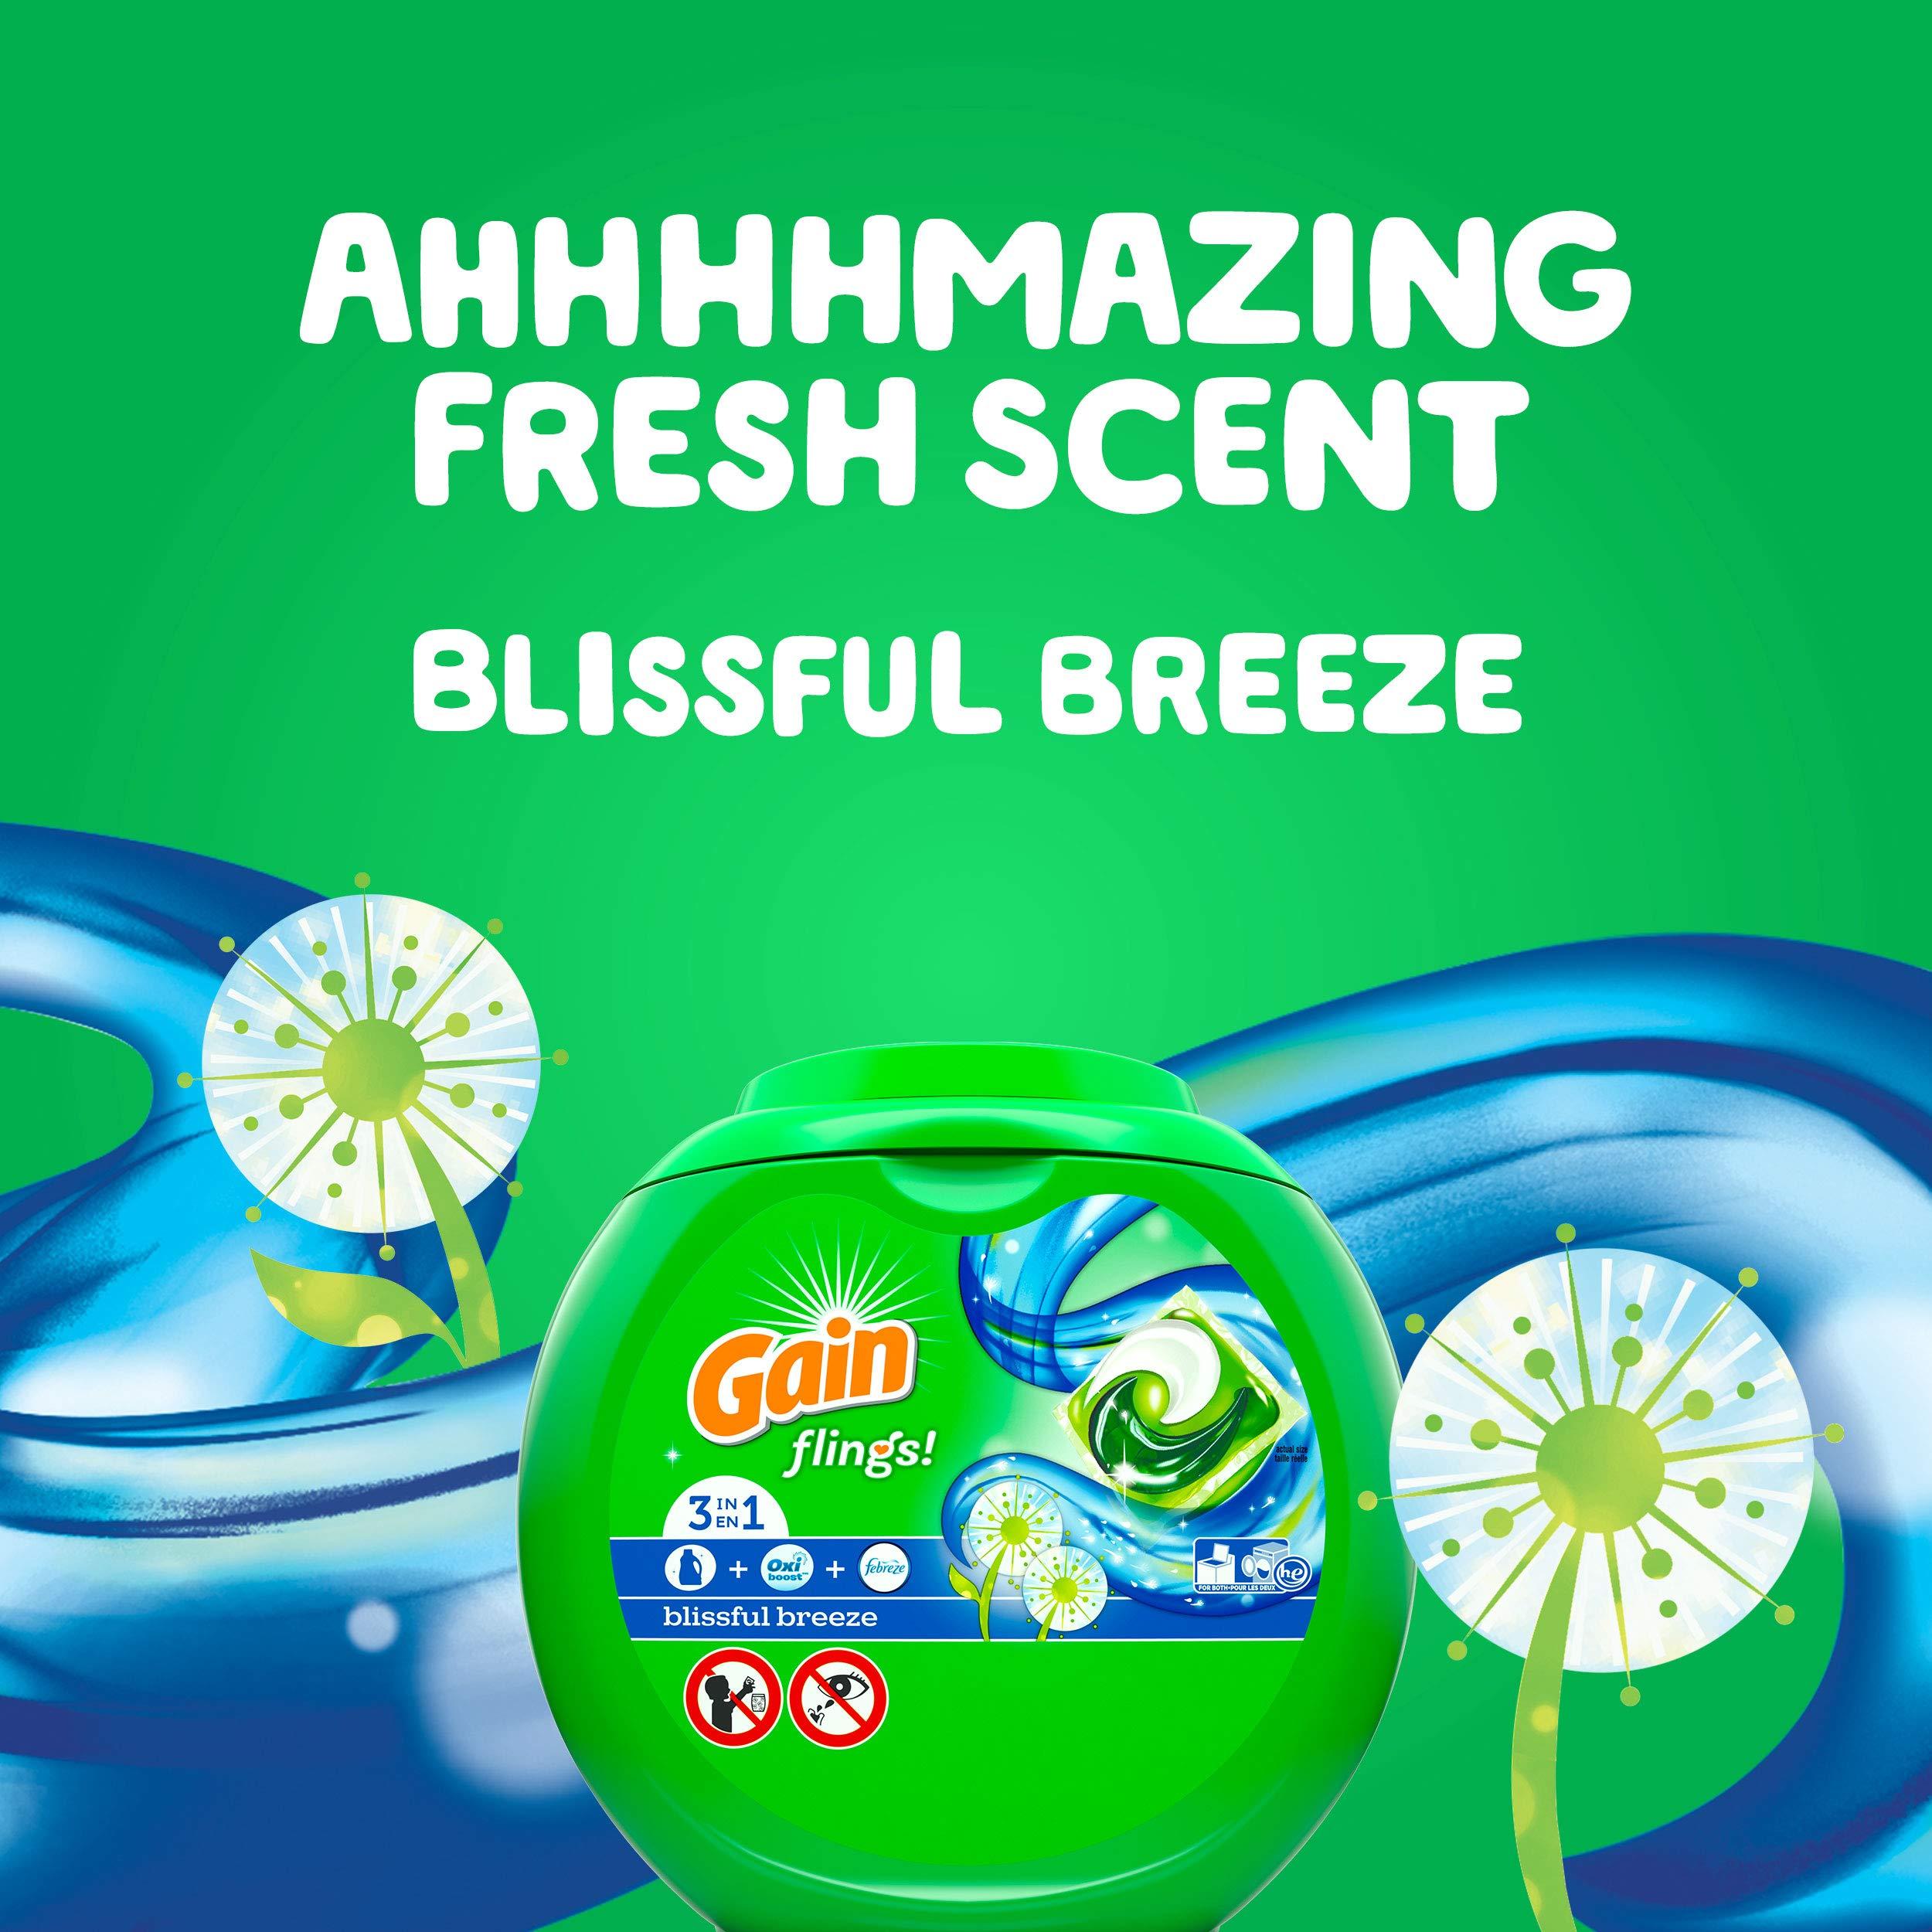 Gain flings! Liquid Laundry Detergent Pacs, Blissful Breeze, 96 Count by Gain (Image #6)